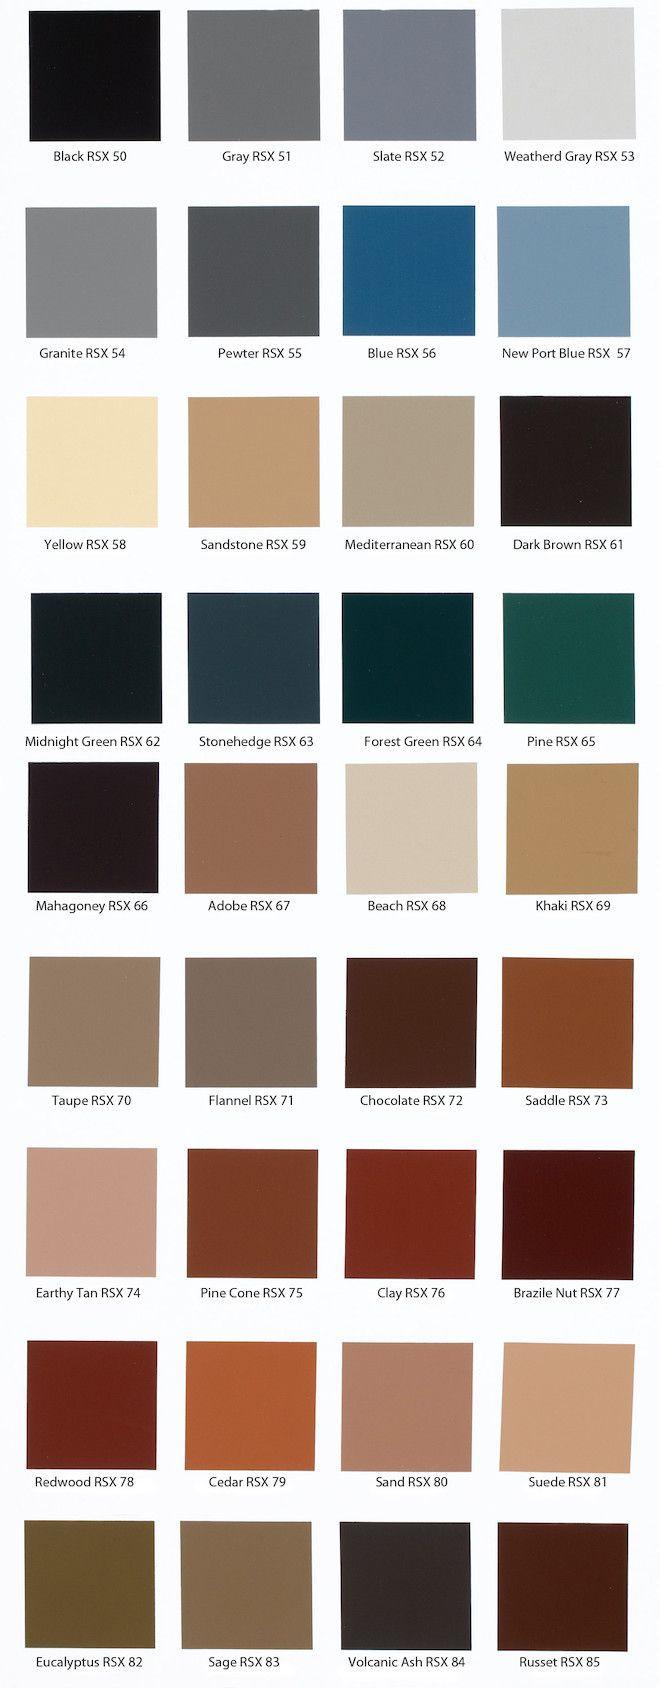 Best ideas about Concrete Paint Colors . Save or Pin Behr Solid Concrete Stain Color Chart … Now.